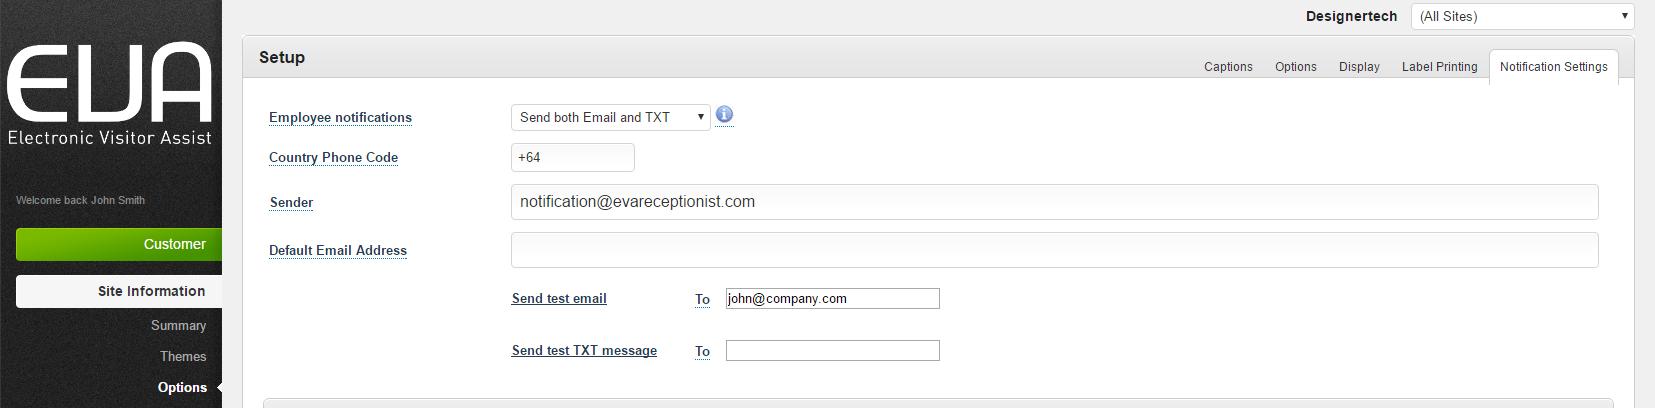 eva-visitor-management-system-sms-notification-configuration-settings.jpg